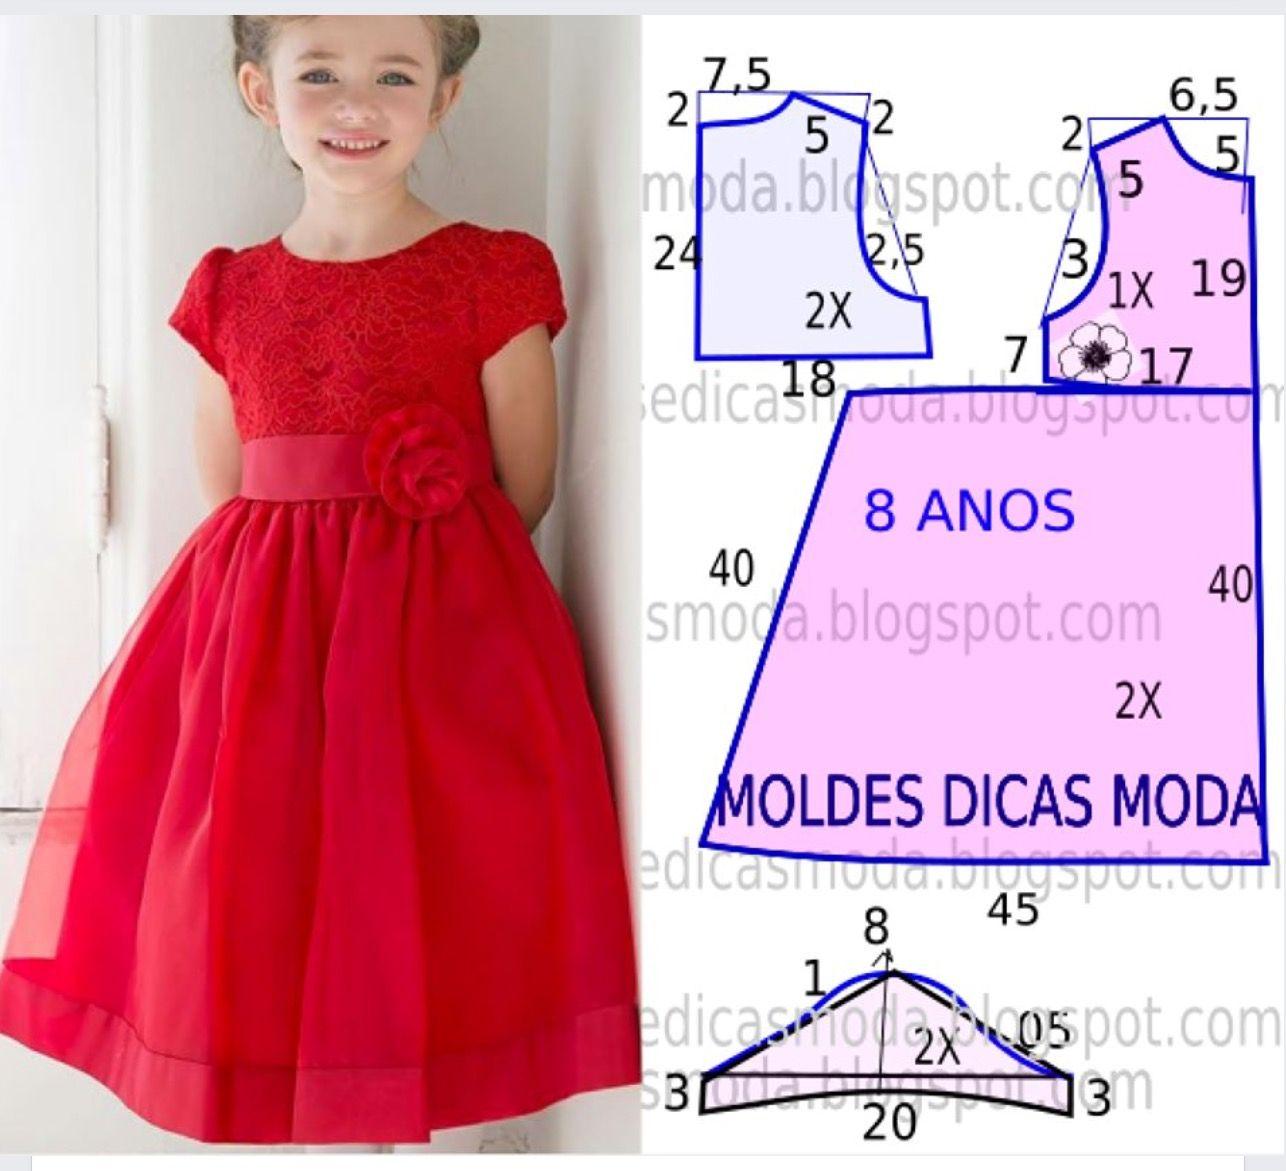 b00b8af31a4b Size 8 years old, measurements in cm. | girls dresses | Kids dress ...